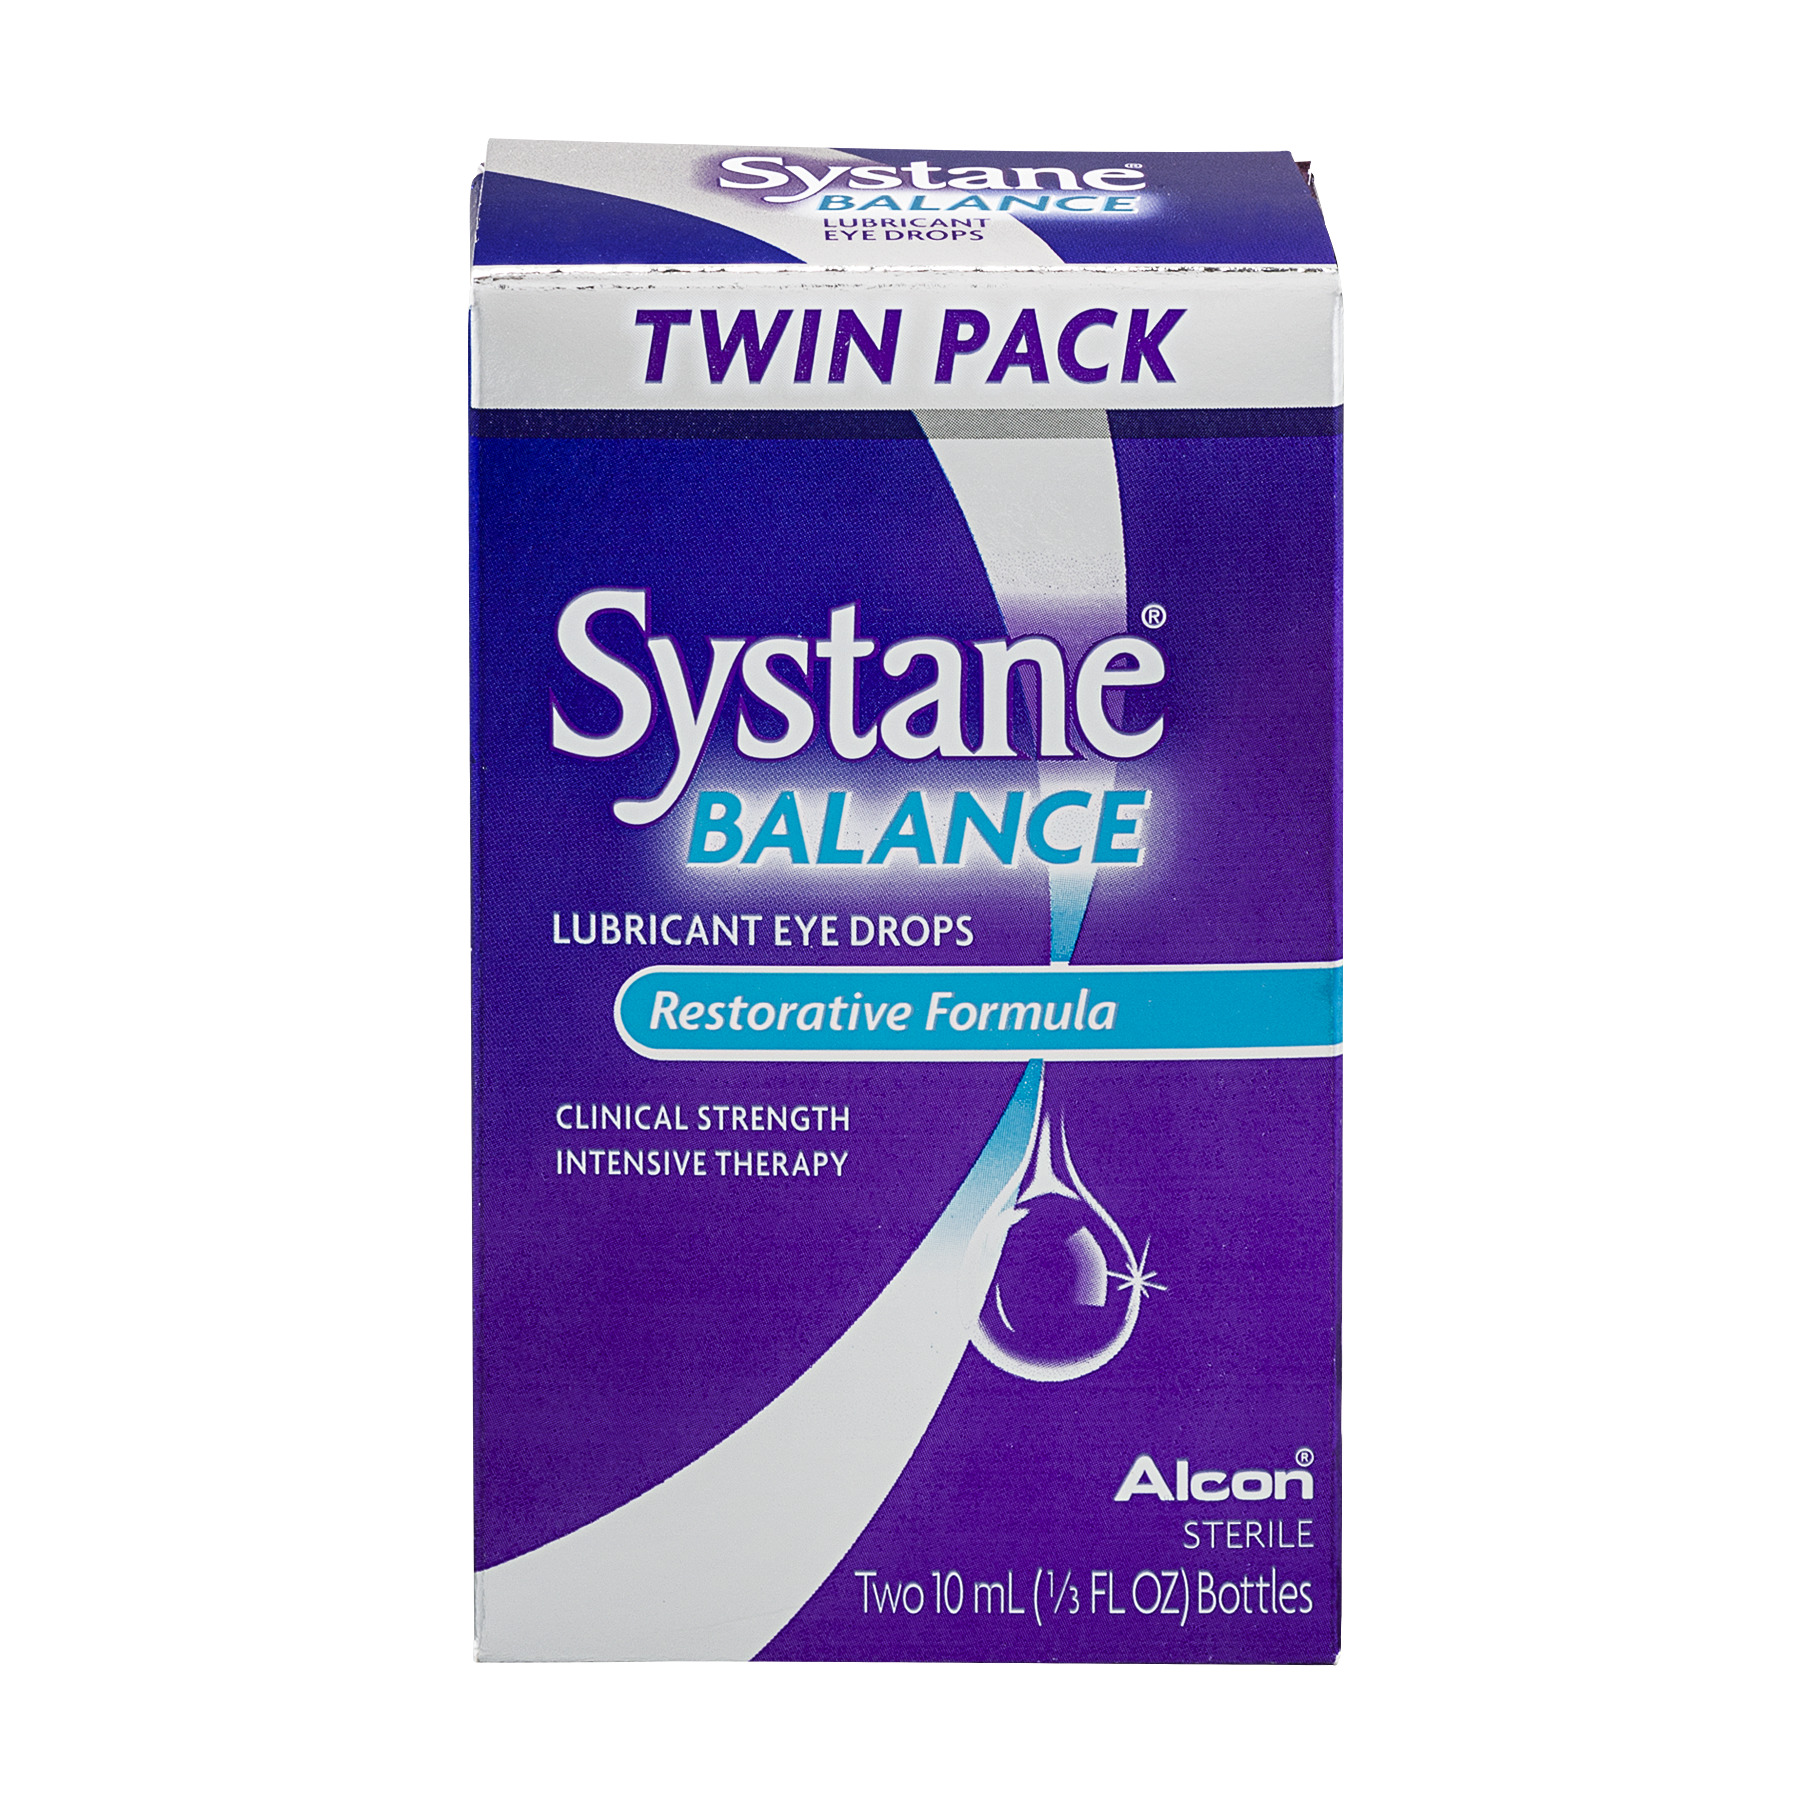 Systane Balance Lubricant Eye Drops Restorative Formula Twin Pack - 2 CT